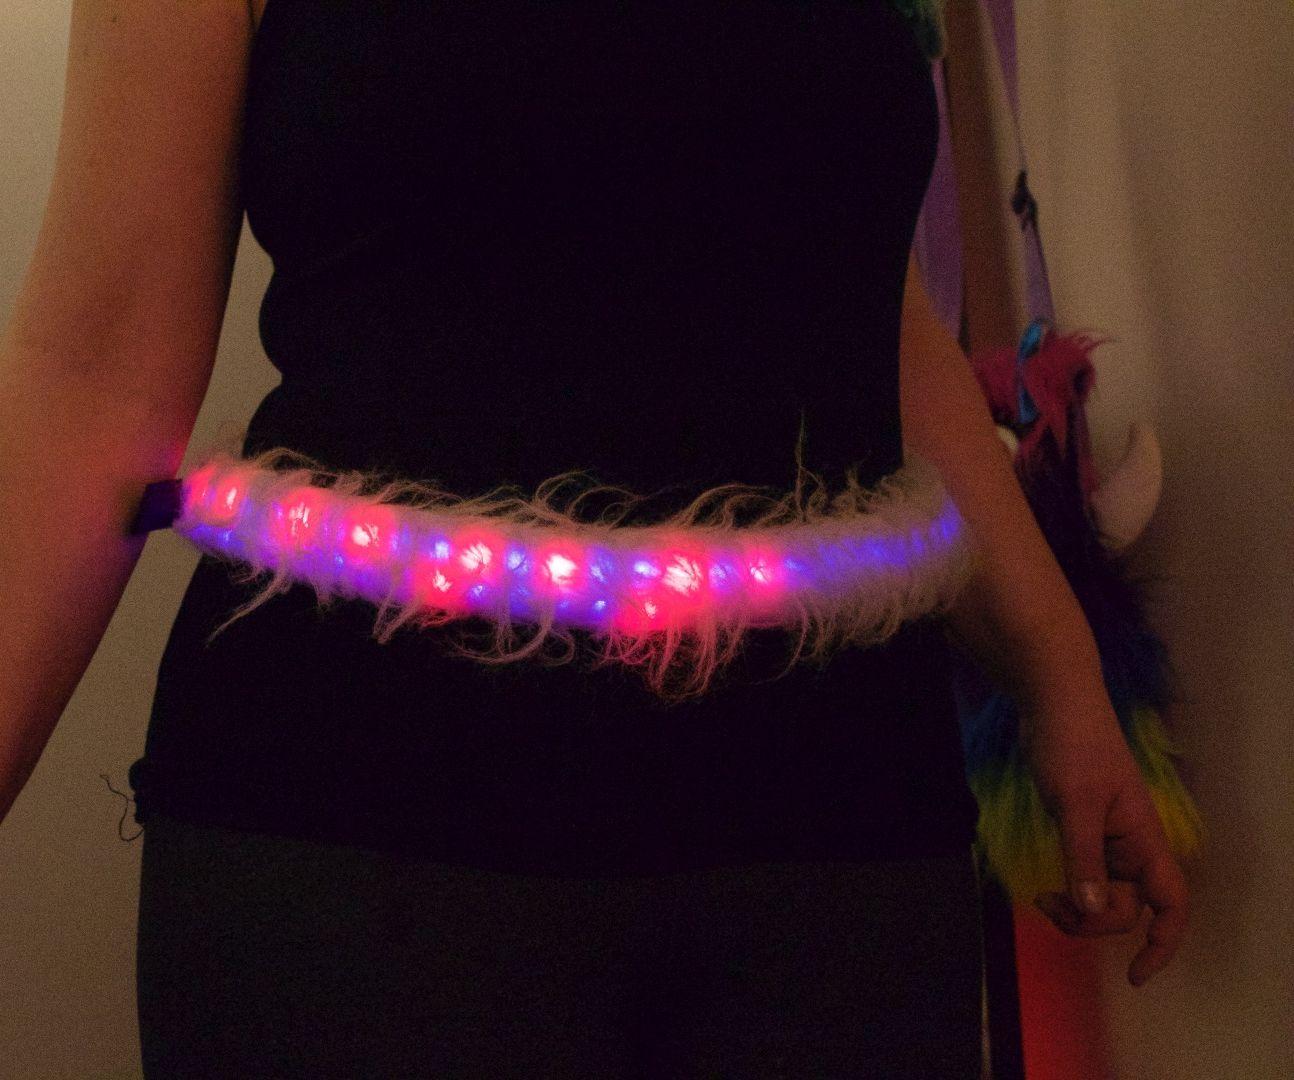 Interactive Fuzzy LED Belt